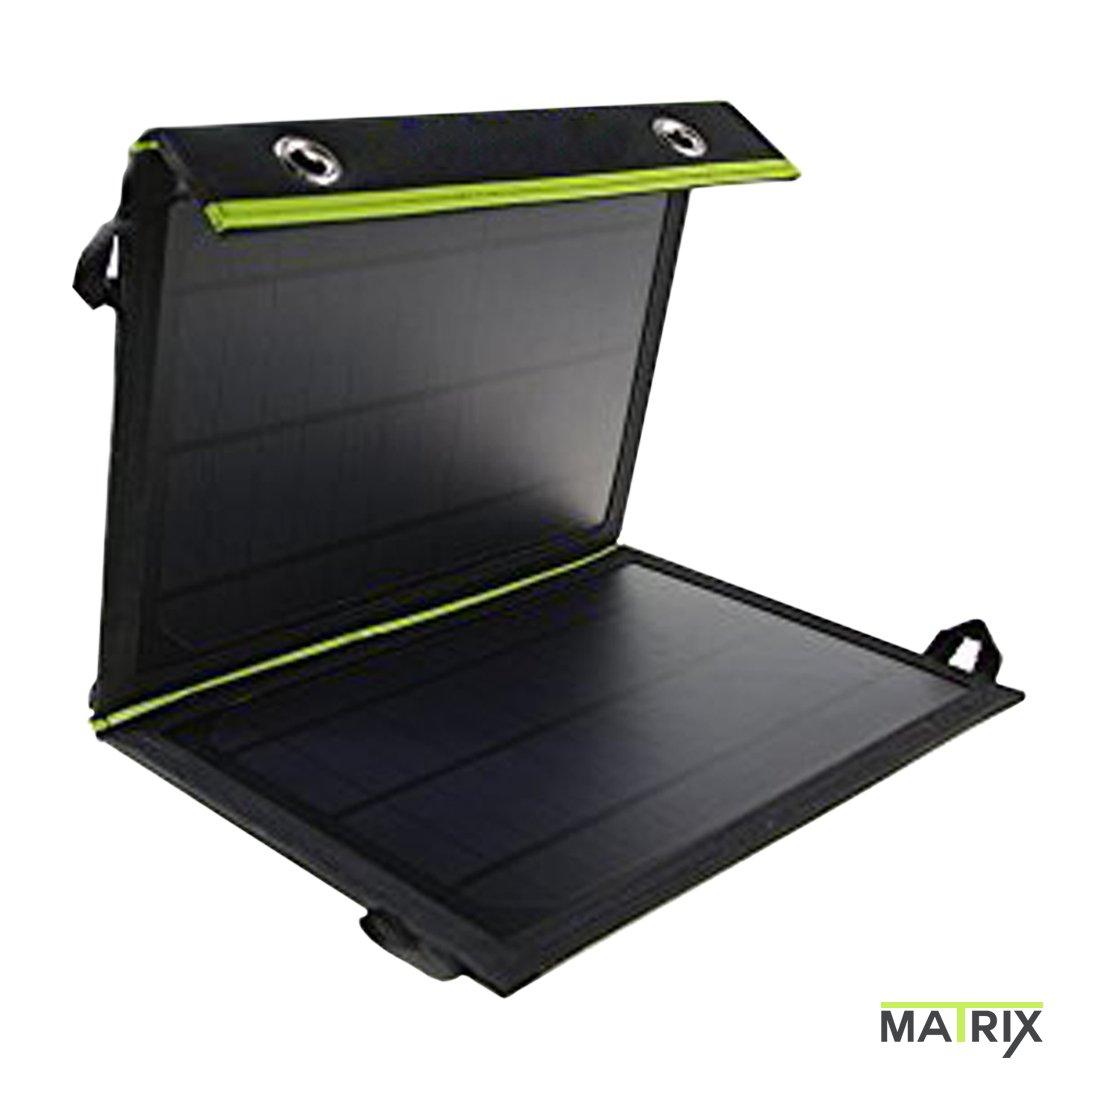 MATRIX 10W 2-Panel Foldable Solar Power Bank with Dual-USB 5V/2A Output